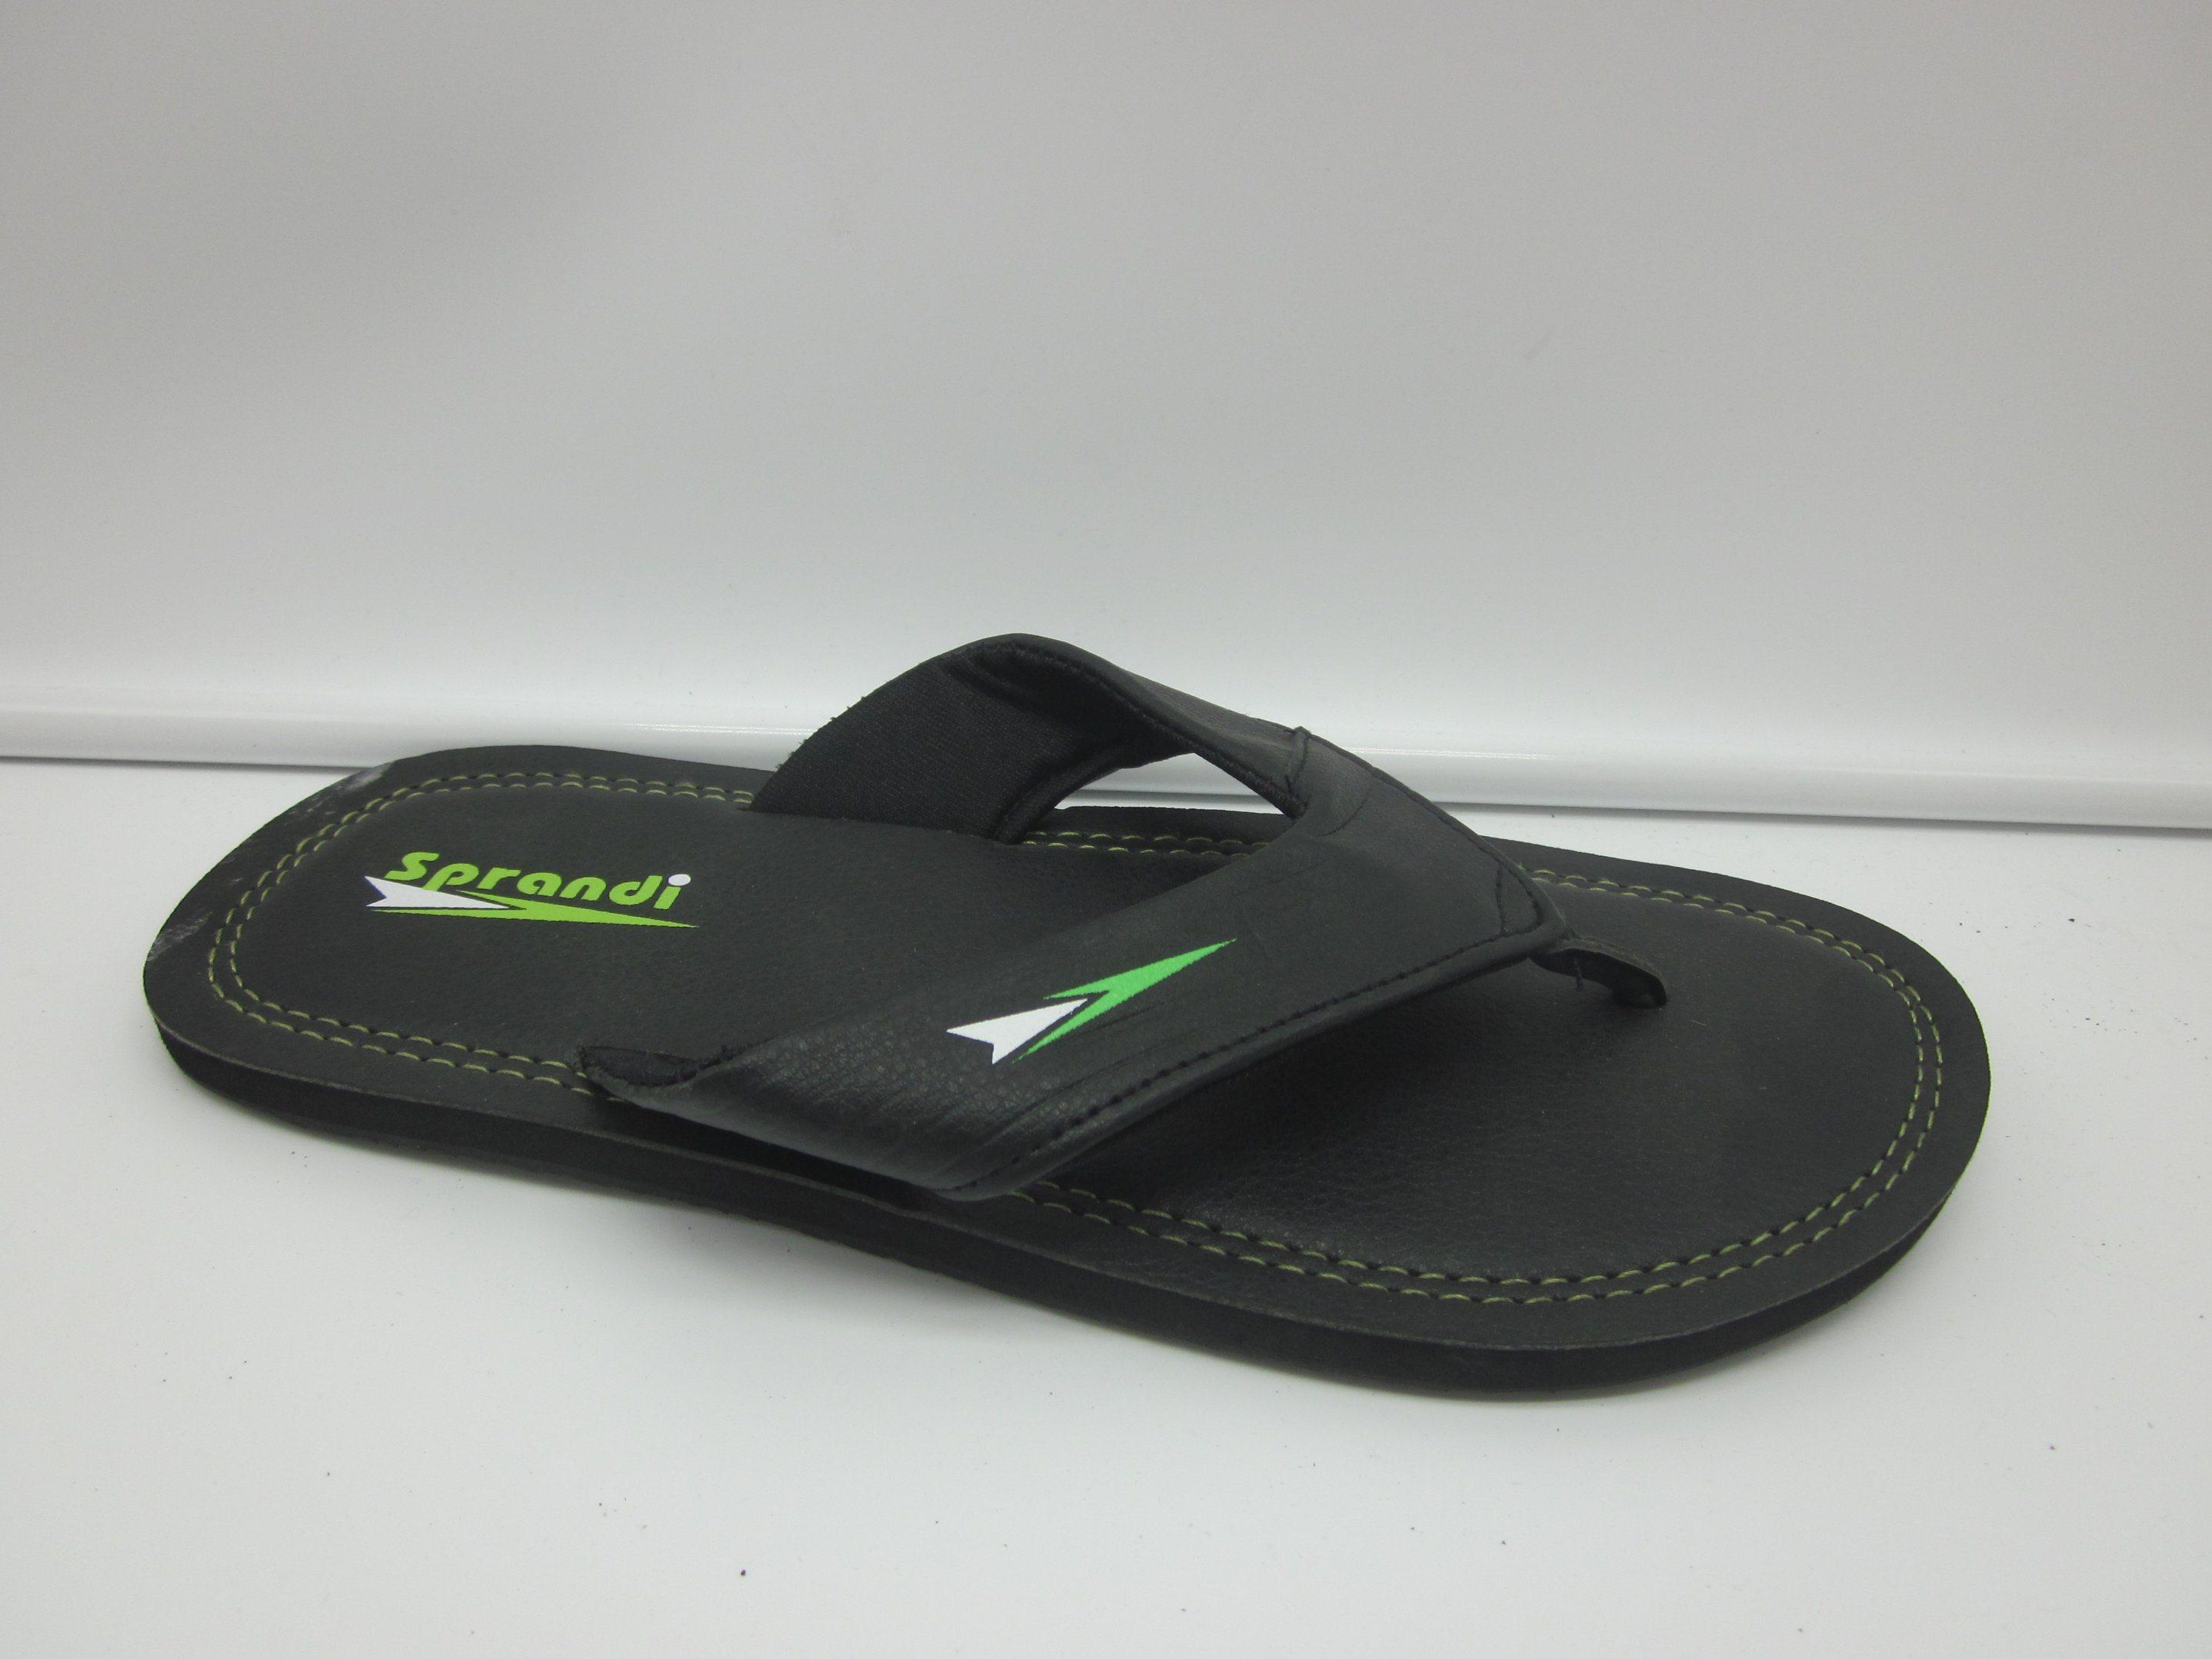 93b6bf1a0 China Fashion Men Beach EVA PVC Rubber Flip Flop Slipper Simple ...